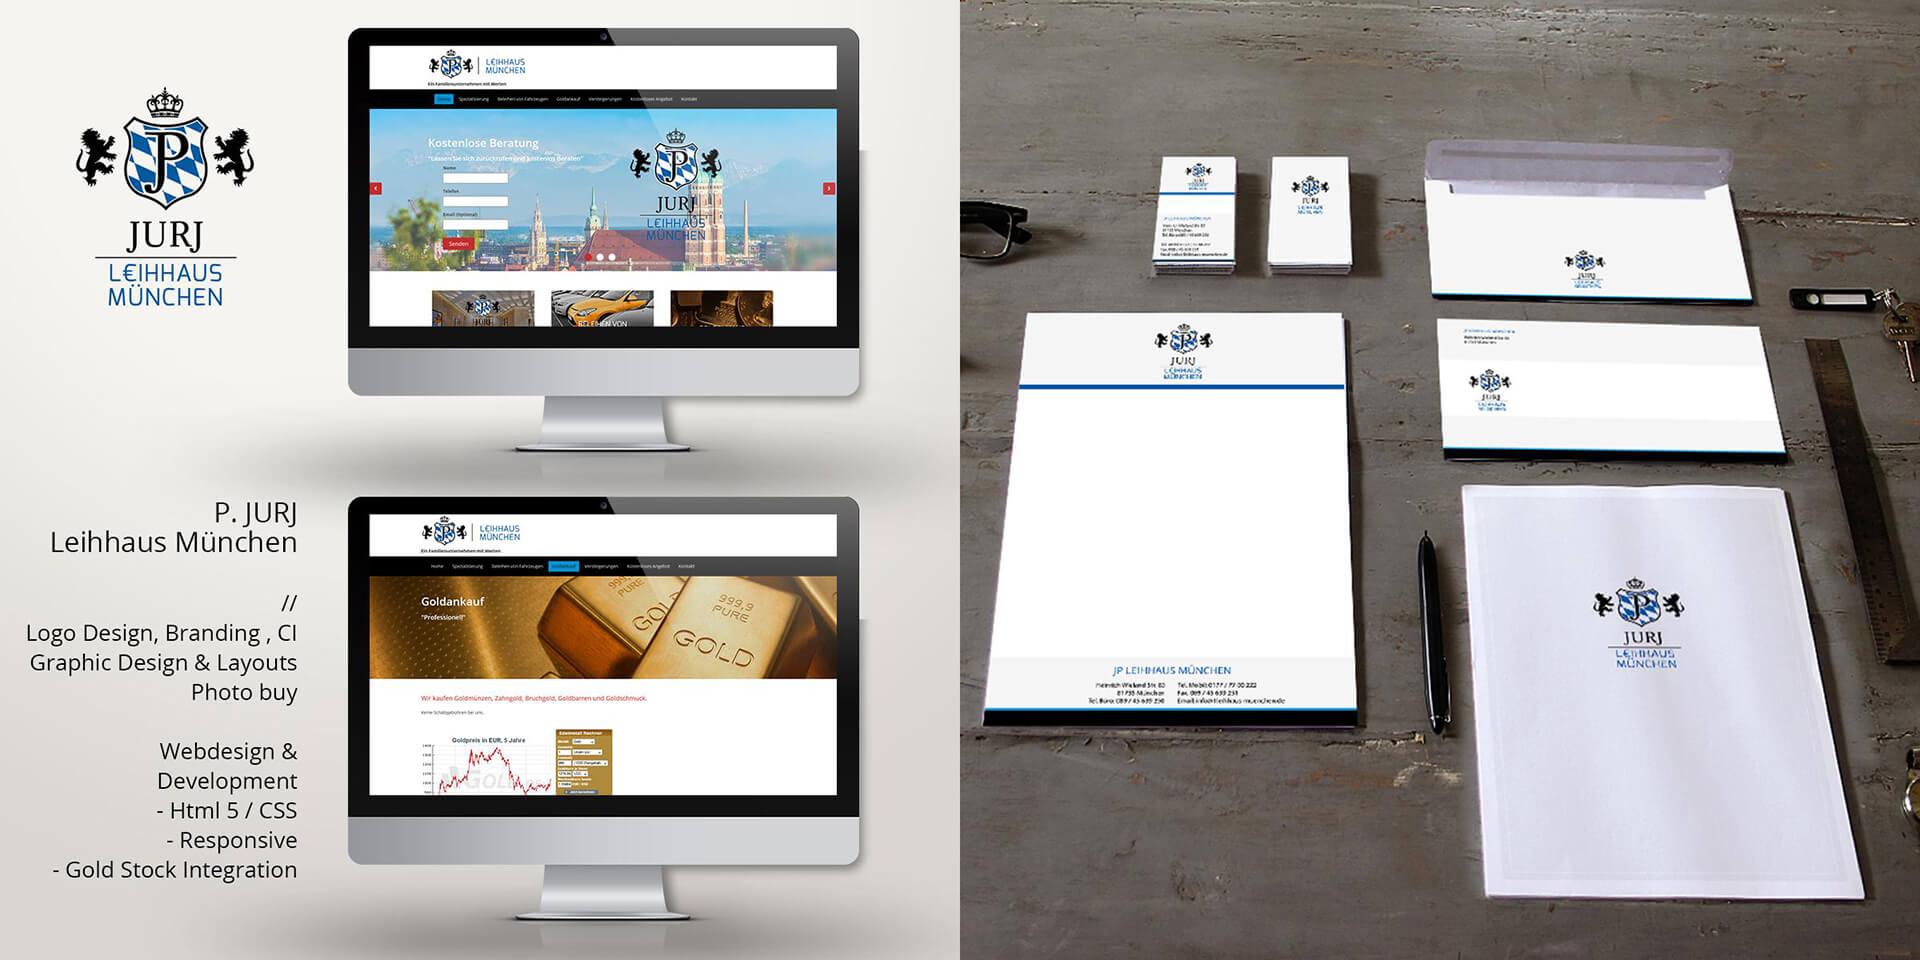 webdesign gfd branding 14